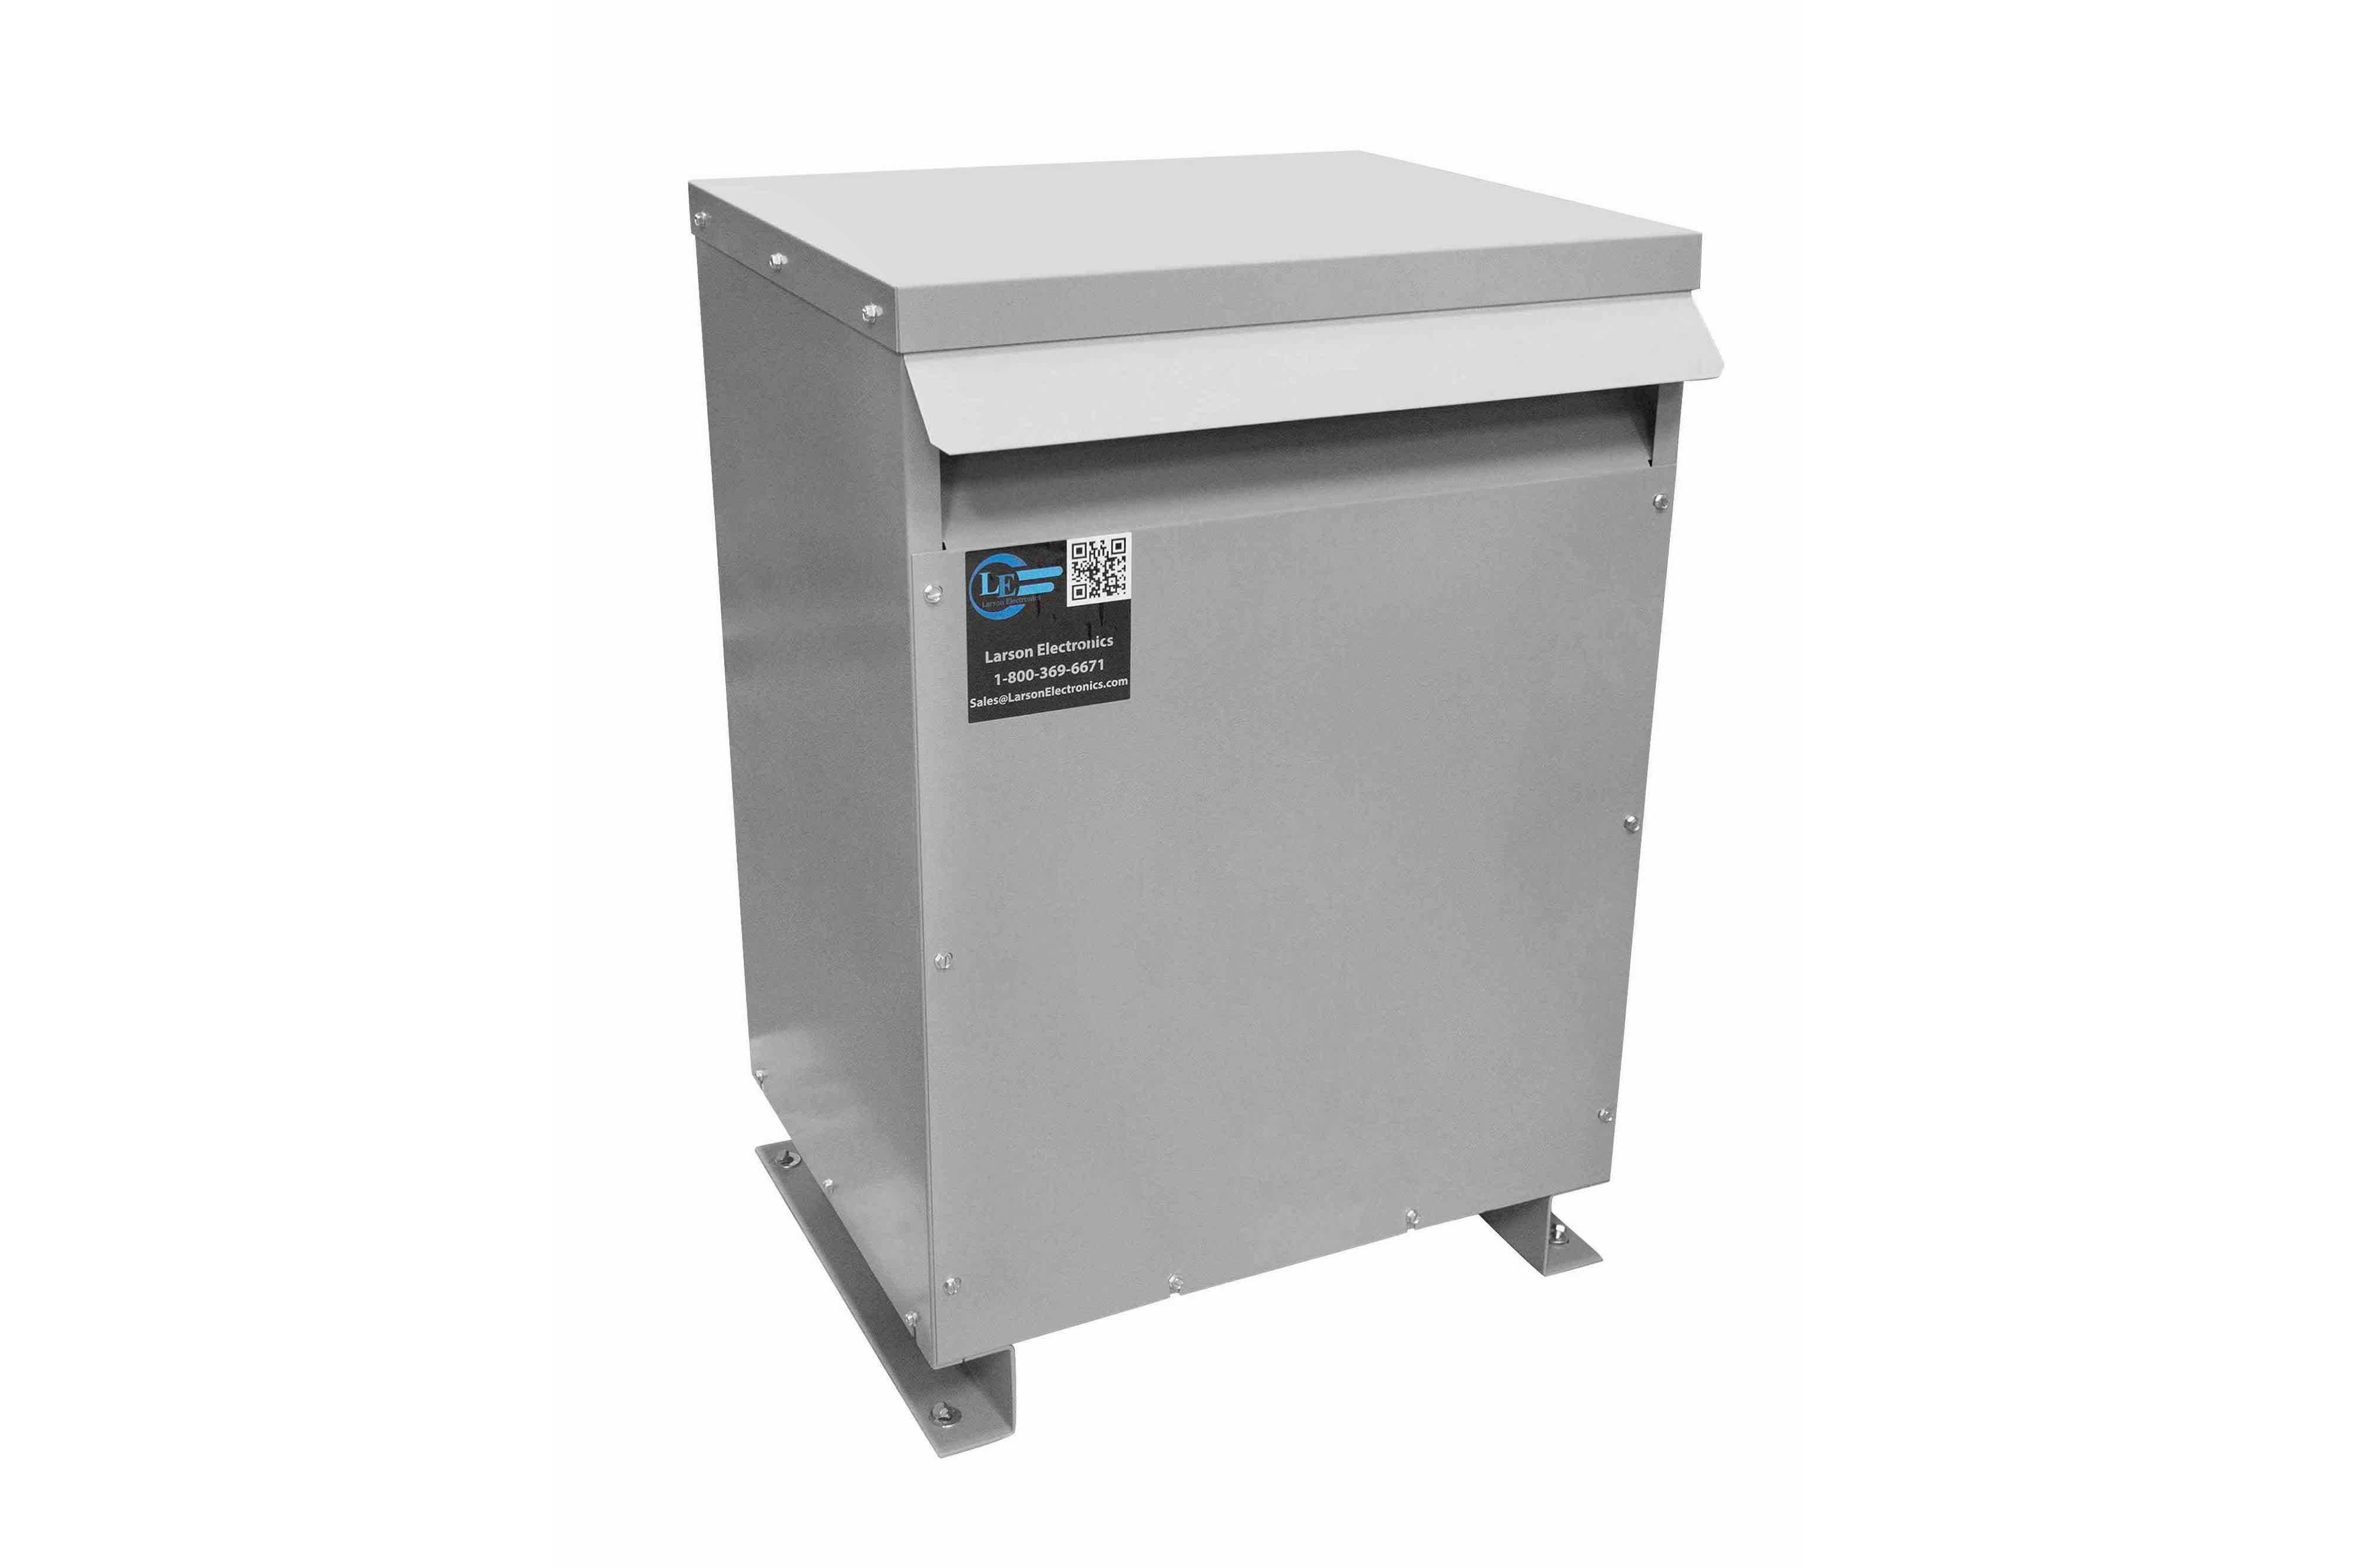 700 kVA 3PH Isolation Transformer, 208V Wye Primary, 380Y/220 Wye-N Secondary, N3R, Ventilated, 60 Hz